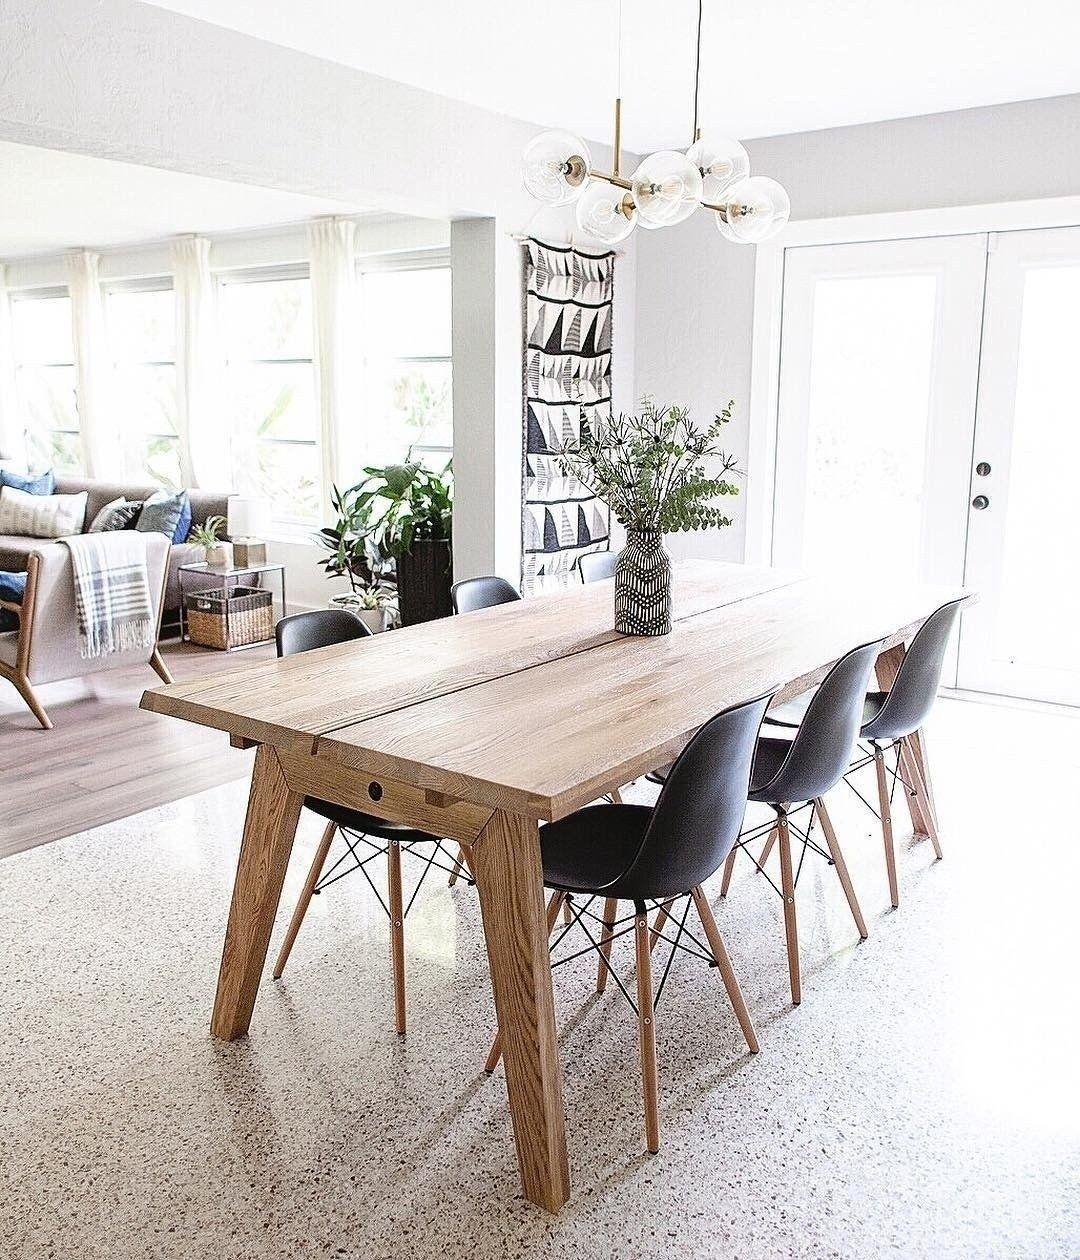 48 Fabulous Scandinavian Dining Room Design Ideas That Looks Cool Dining Room 48 Fabulous Sca Oak Dining Table Modern Dining Table Scandinavian Dining Room